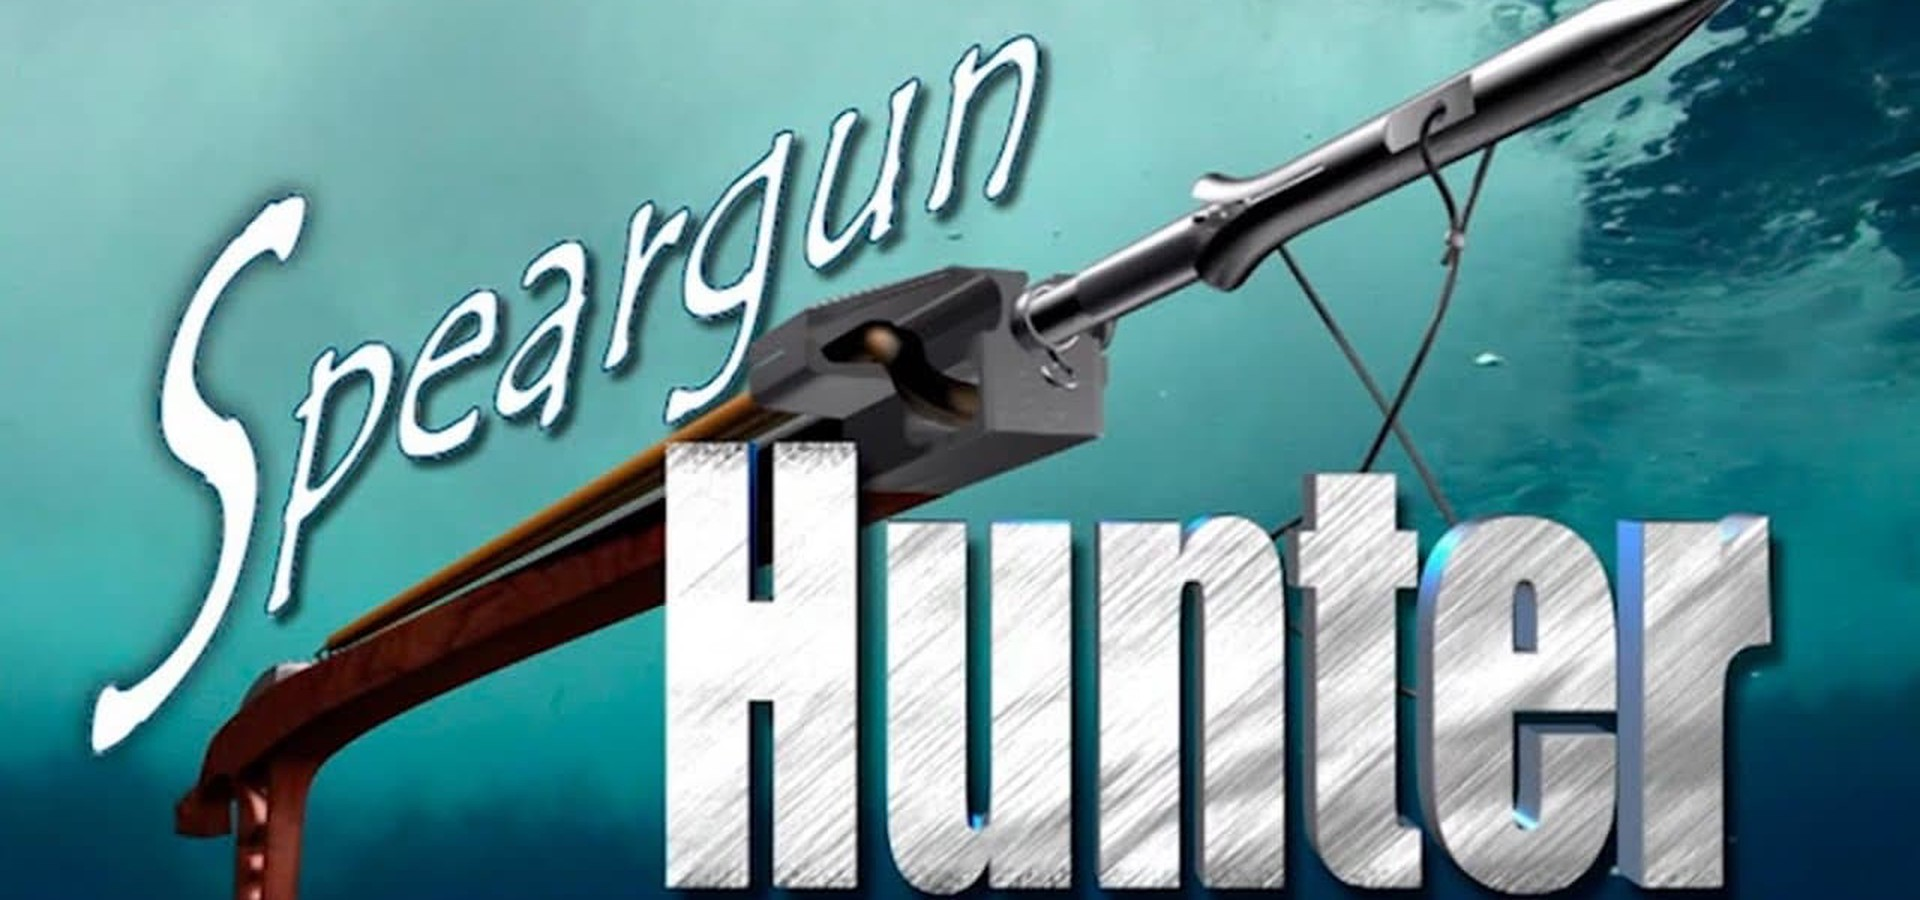 Speargun Hunter